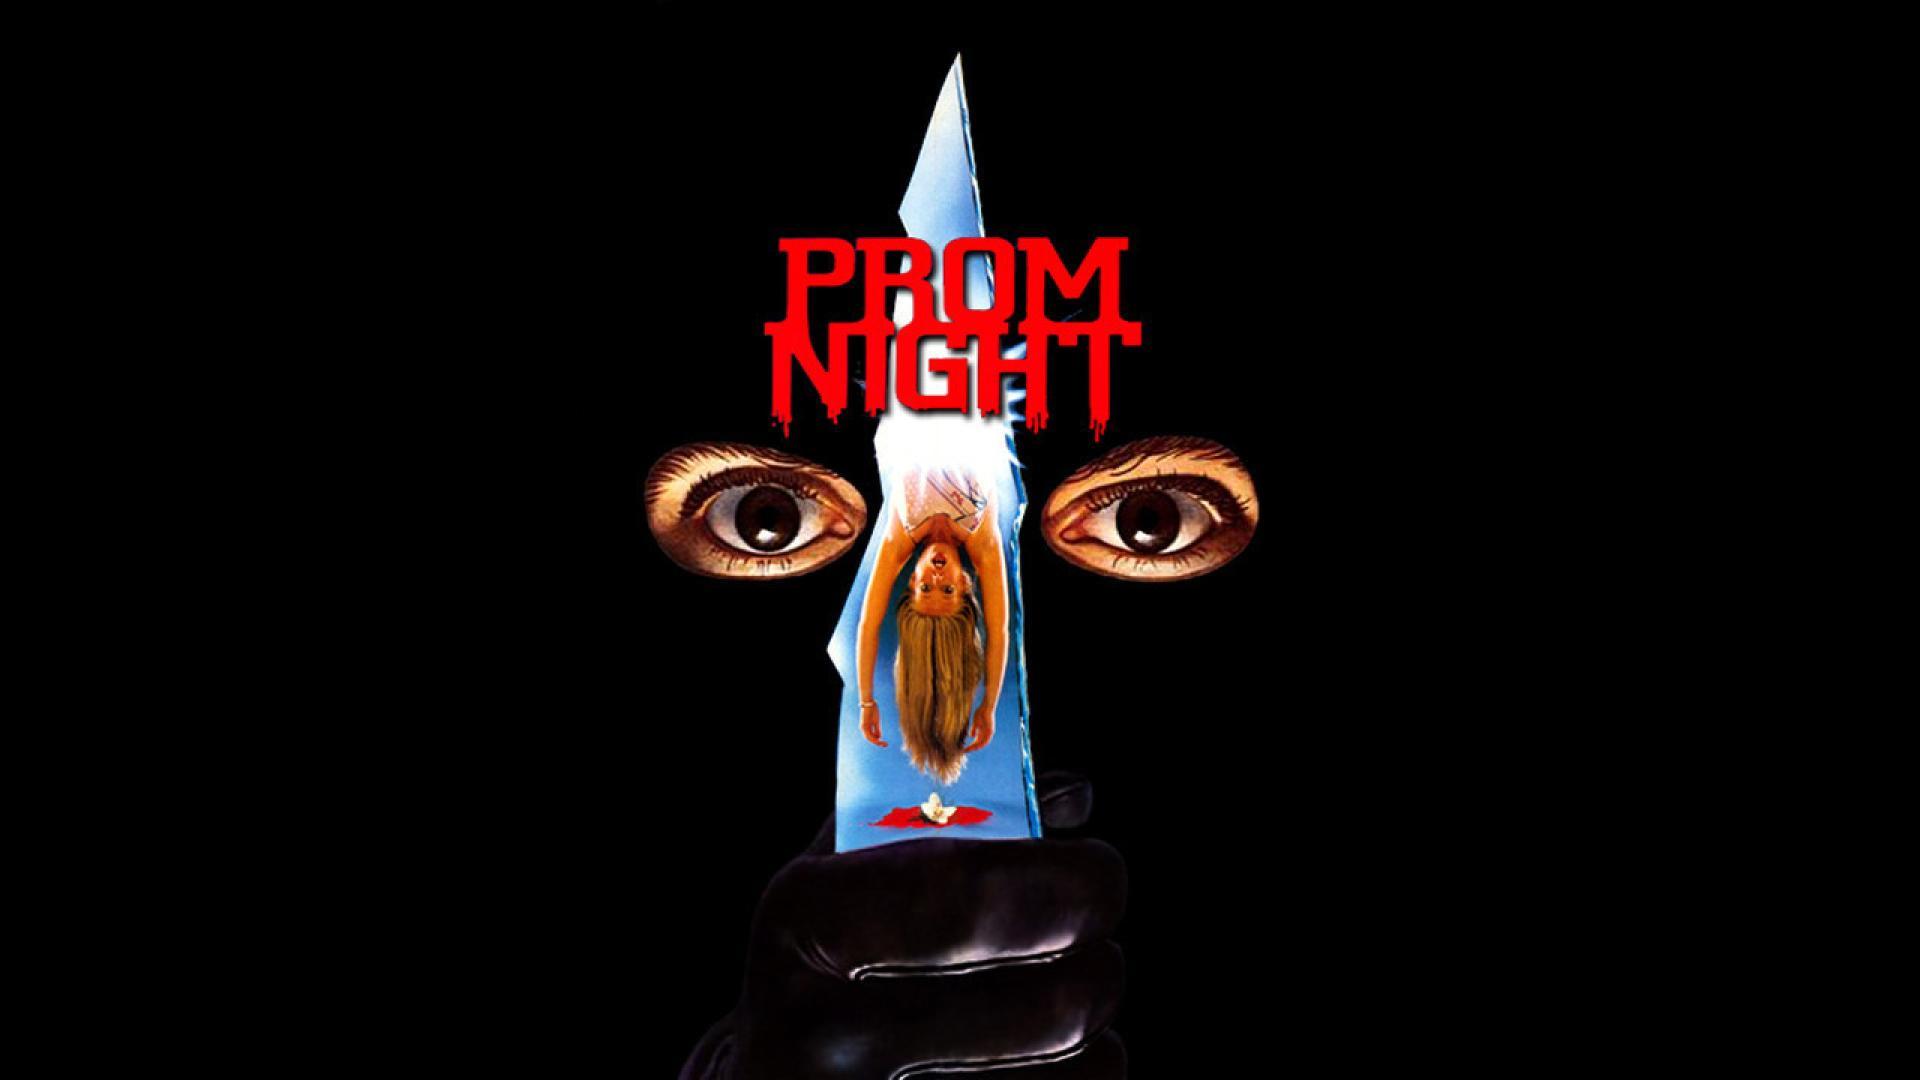 Prom Night - A szalagavató fantomja (1980)